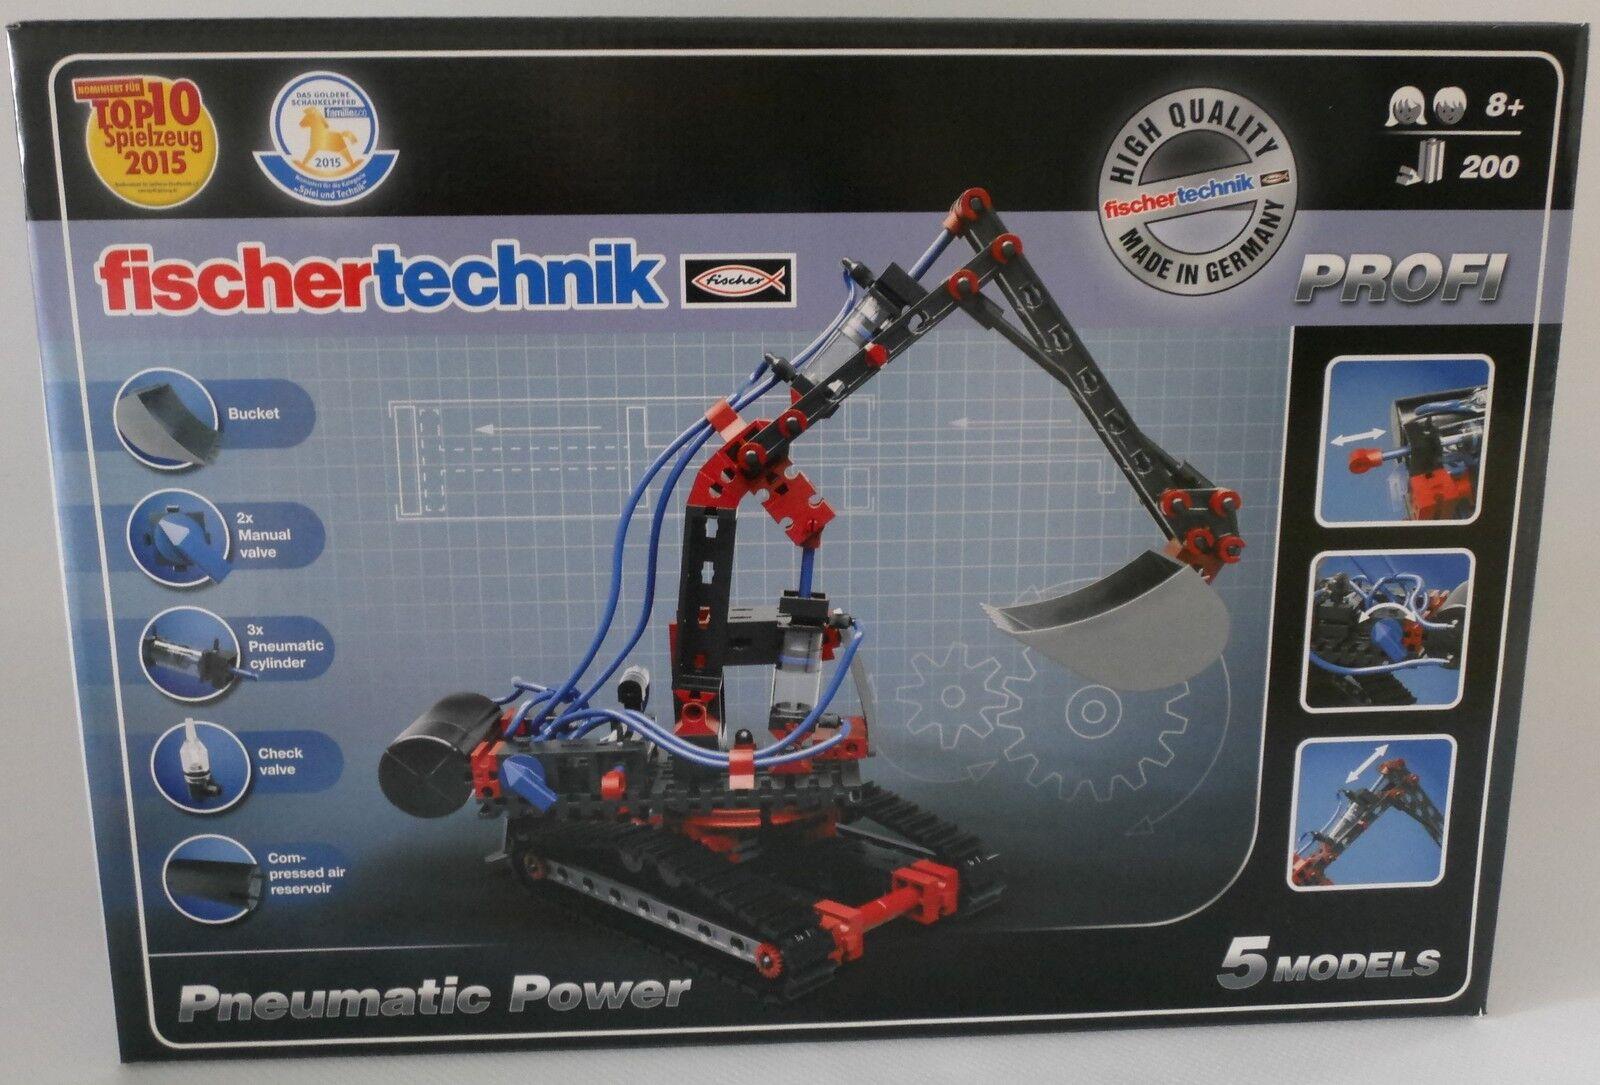 NEU fischertechnik 533874 PROFI Pneumatic Power OVP